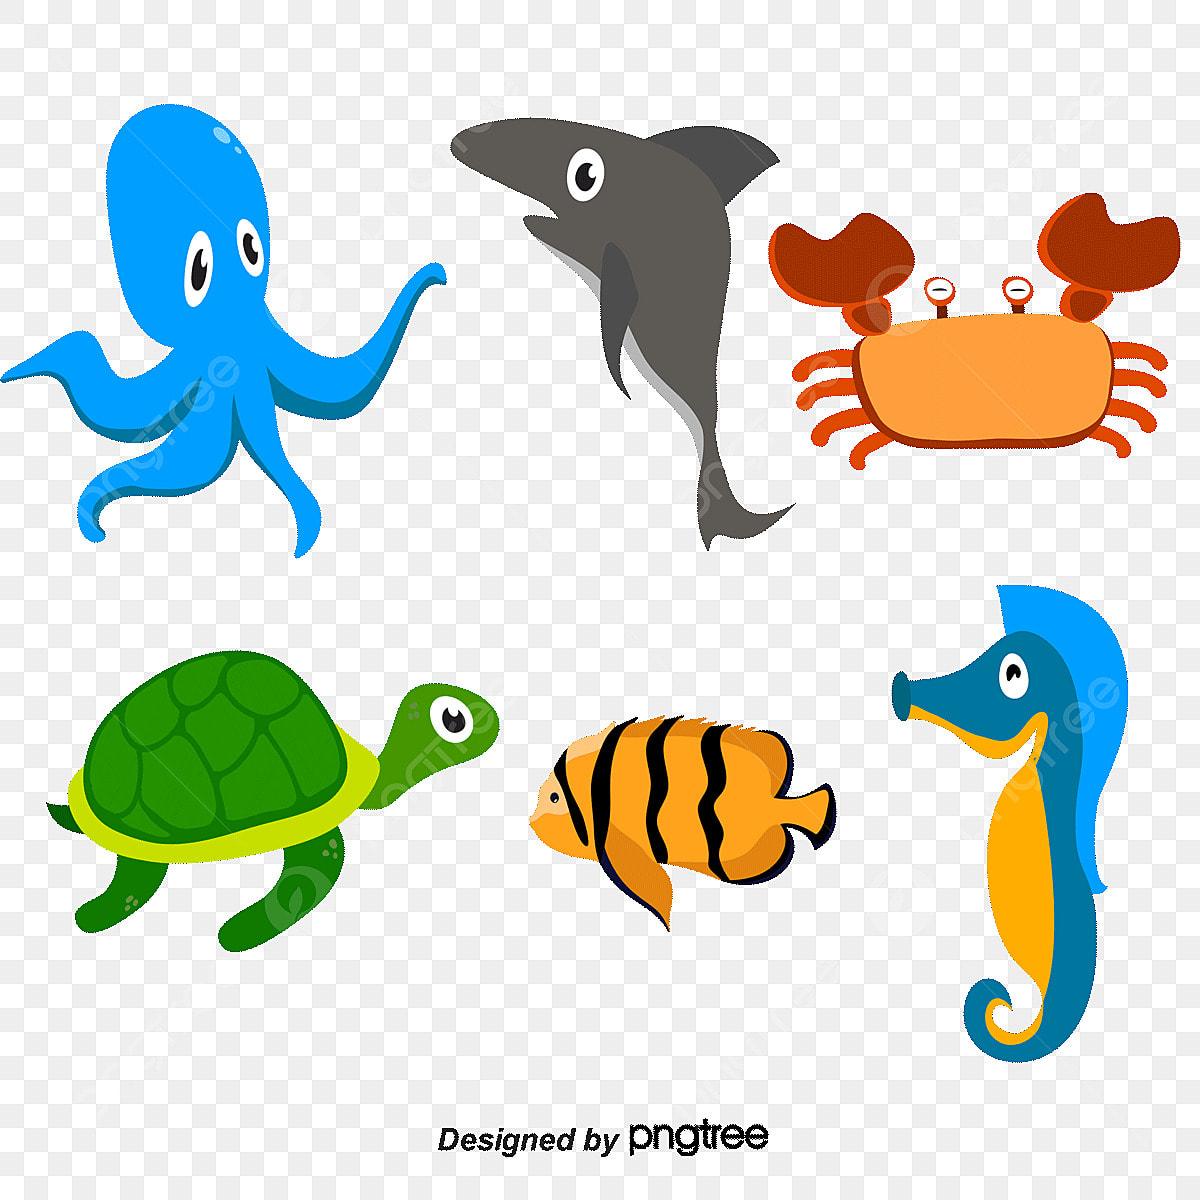 Animais Coloridos Color Animal Animais Dos Desenhos Animados